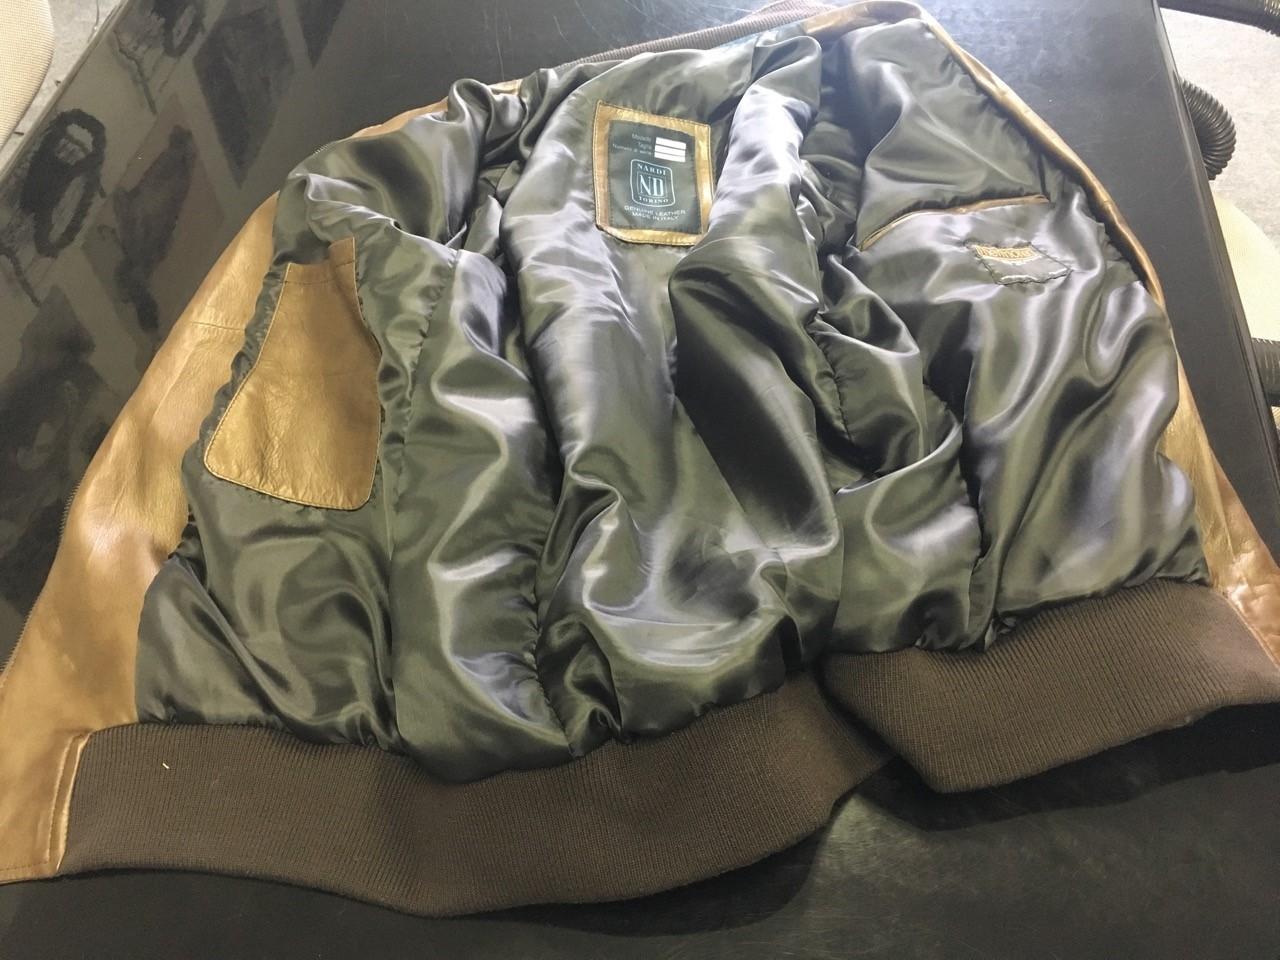 89afc8efa Nardi Thermore Insulated Genuine Lamb Leather Zippered Jacket - Black -  Size 56 (Italian) - Part # 0505.56.0001